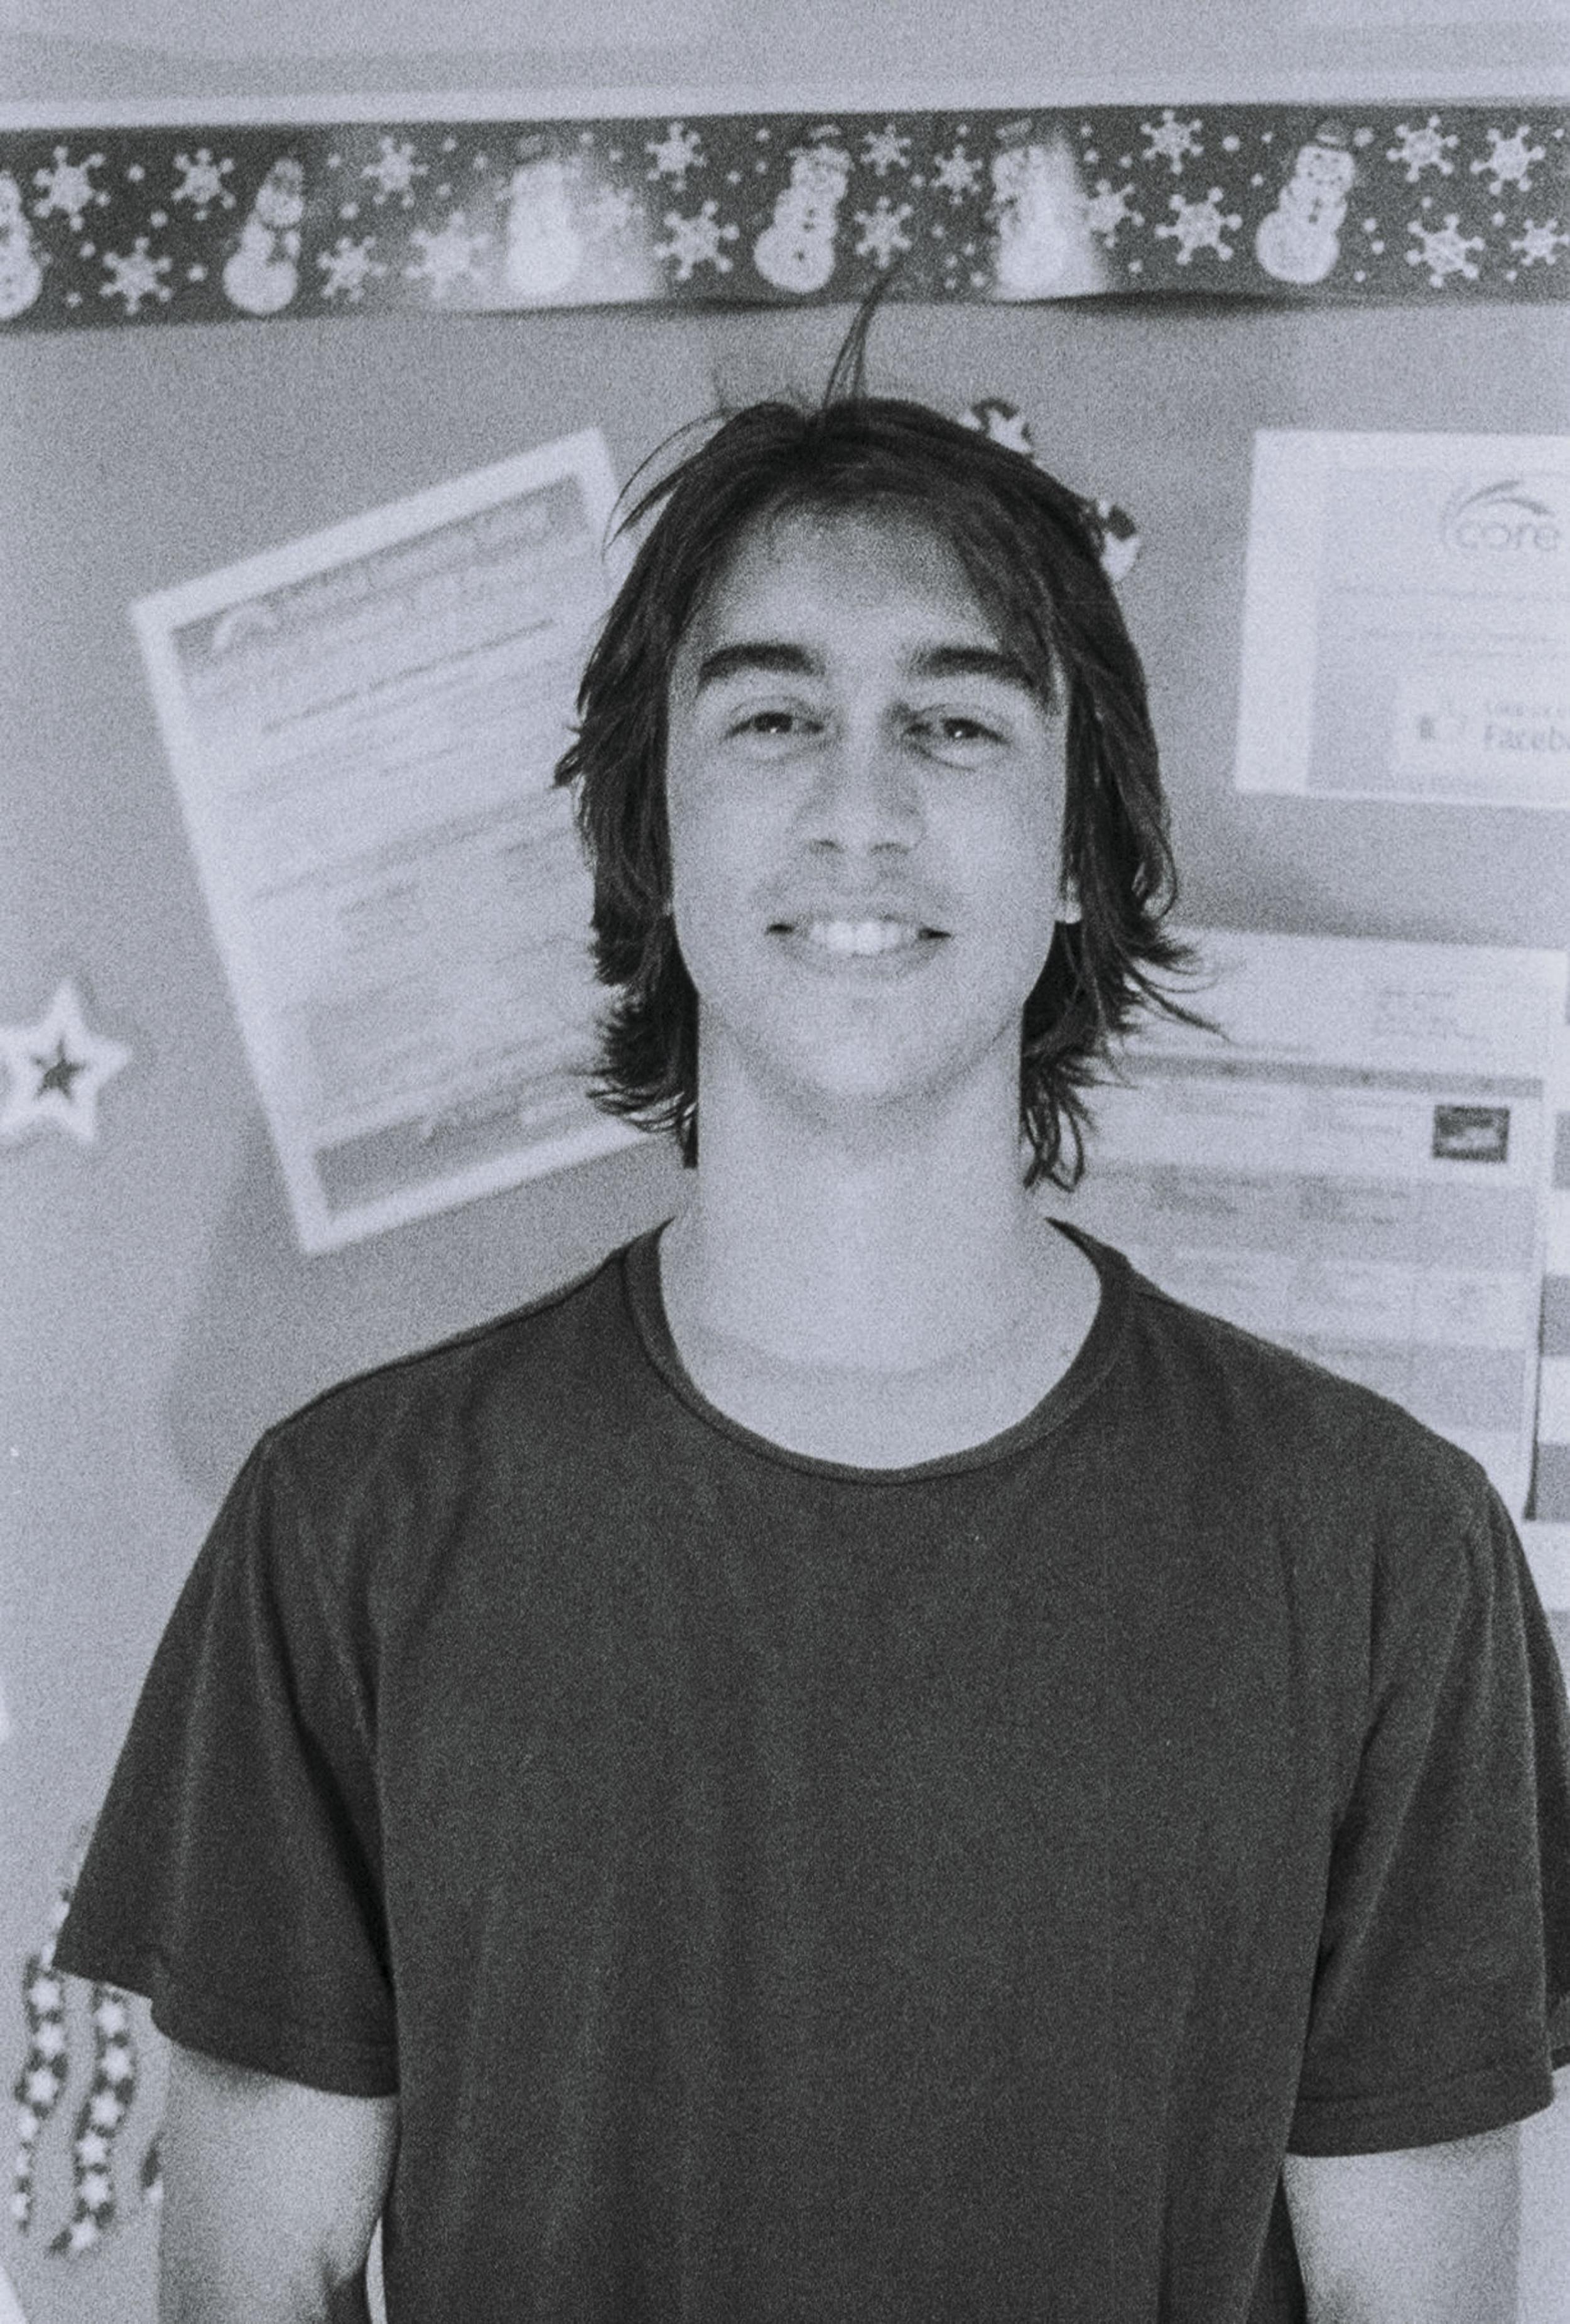 Alex Giannascoli